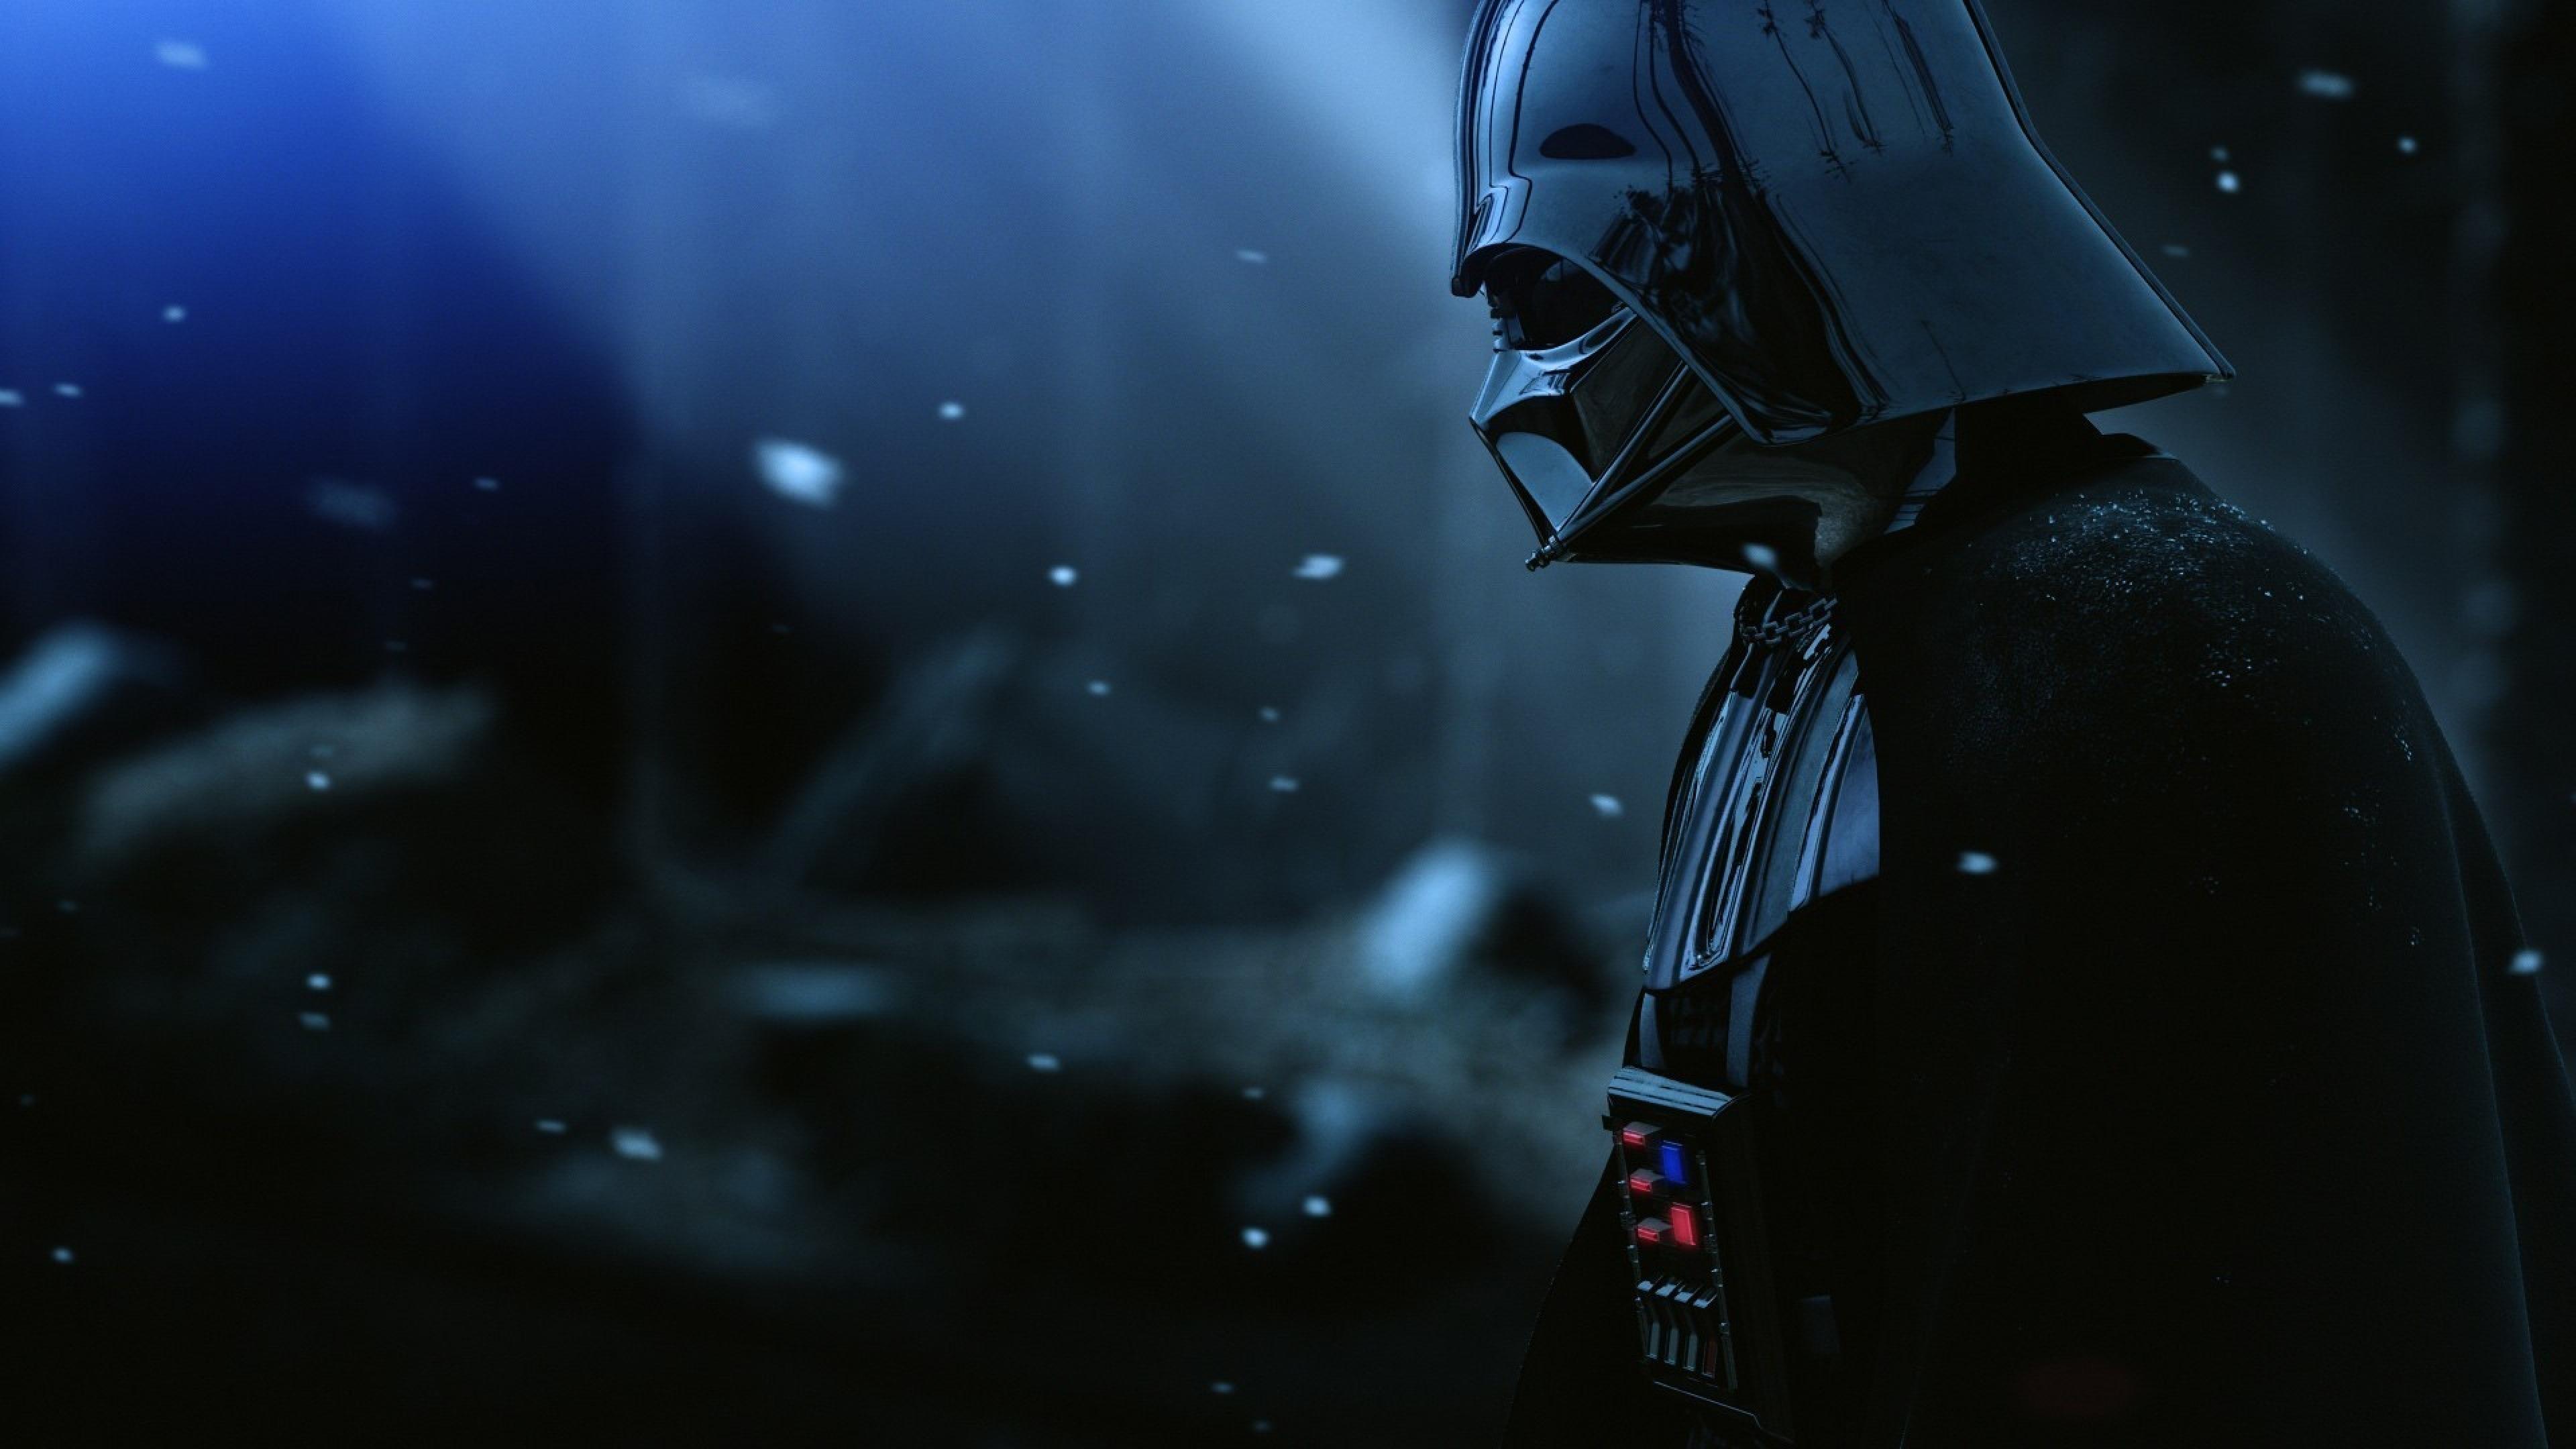 Free Download Wallpaper 3840x2160 Darth Vader Armor Star Wars Film Hat Snow 4k 3840x2160 For Your Desktop Mobile Tablet Explore 39 4k Ultra Wide Wallpapers Ultra Hd 3840x2160 Wallpaper